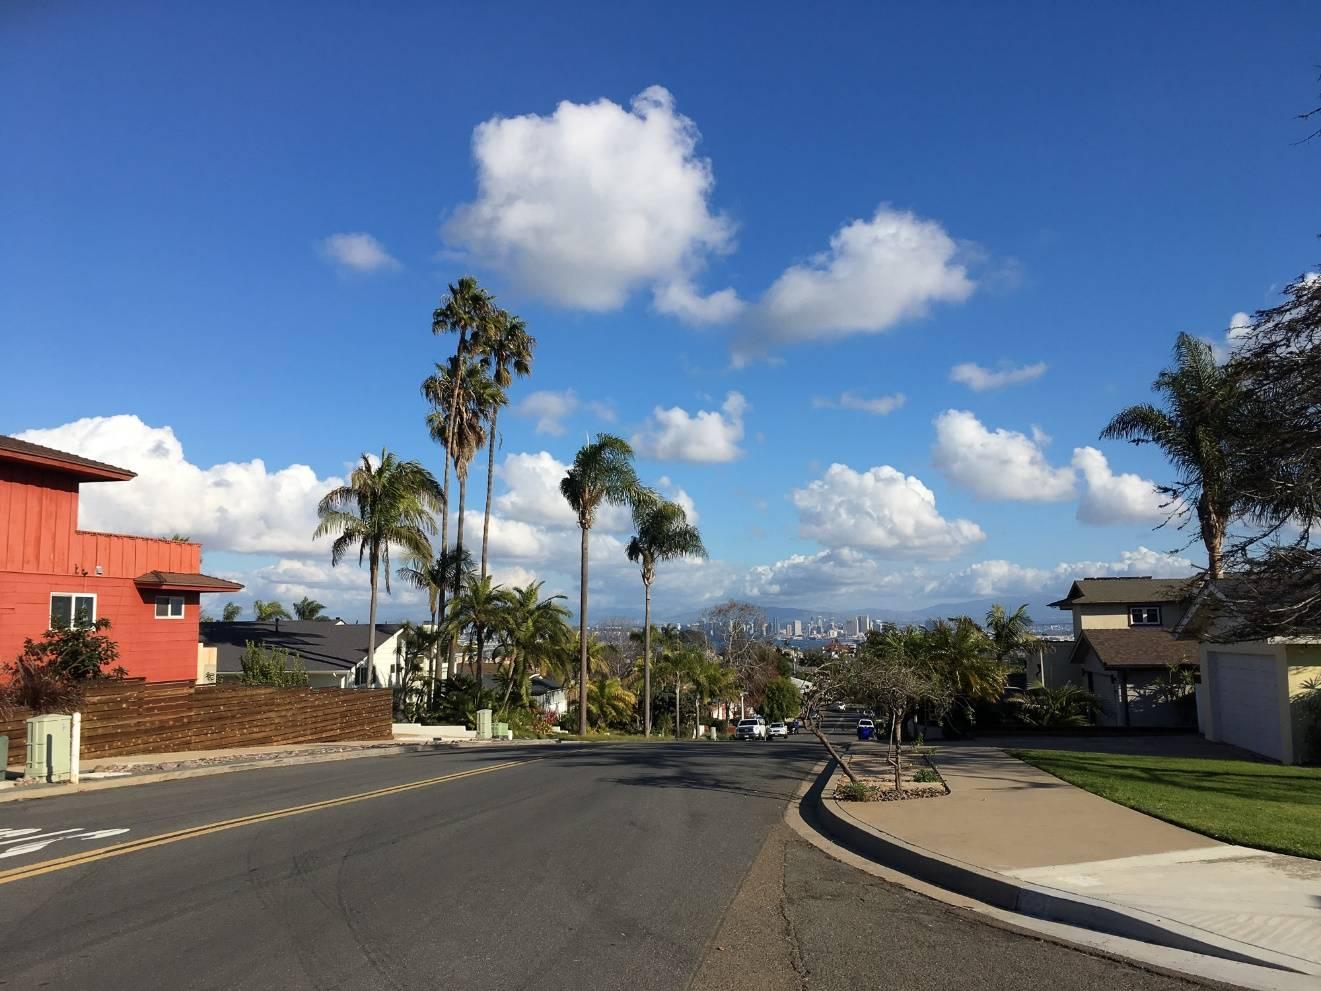 iPhone SE 所摄 San Diego 街景